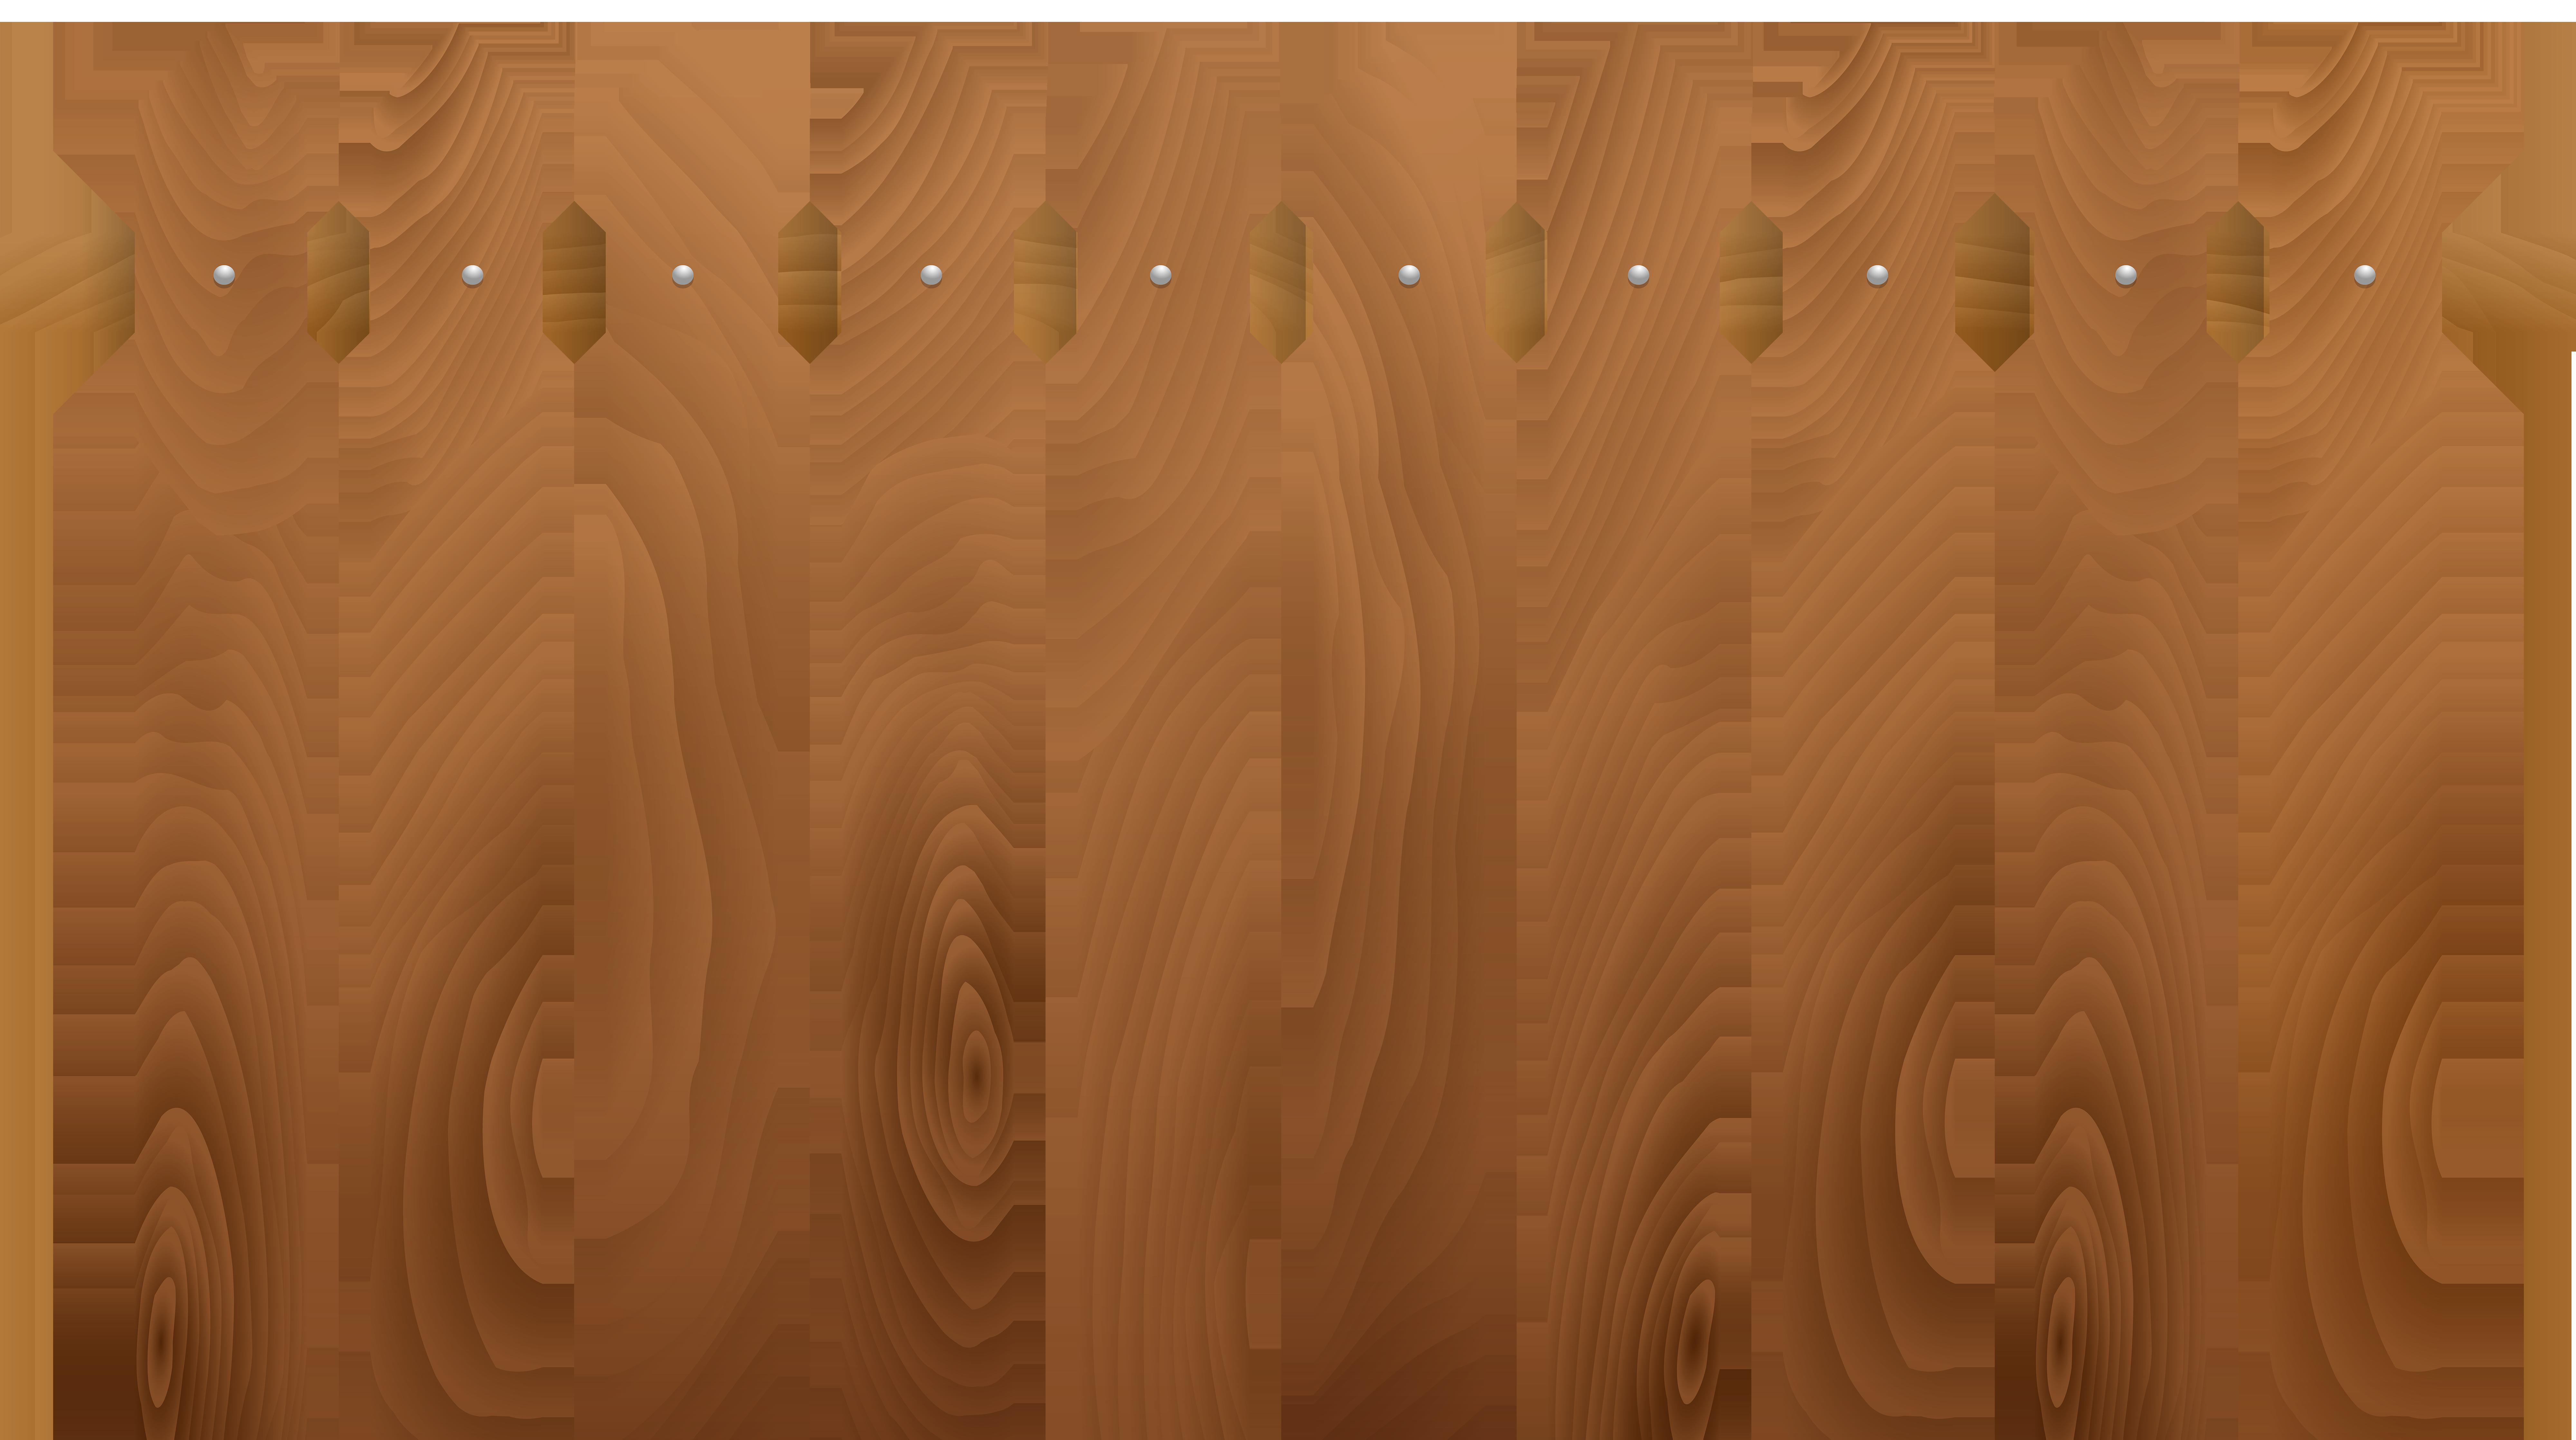 Wooden transparent clip art. Fence clipart wood fence